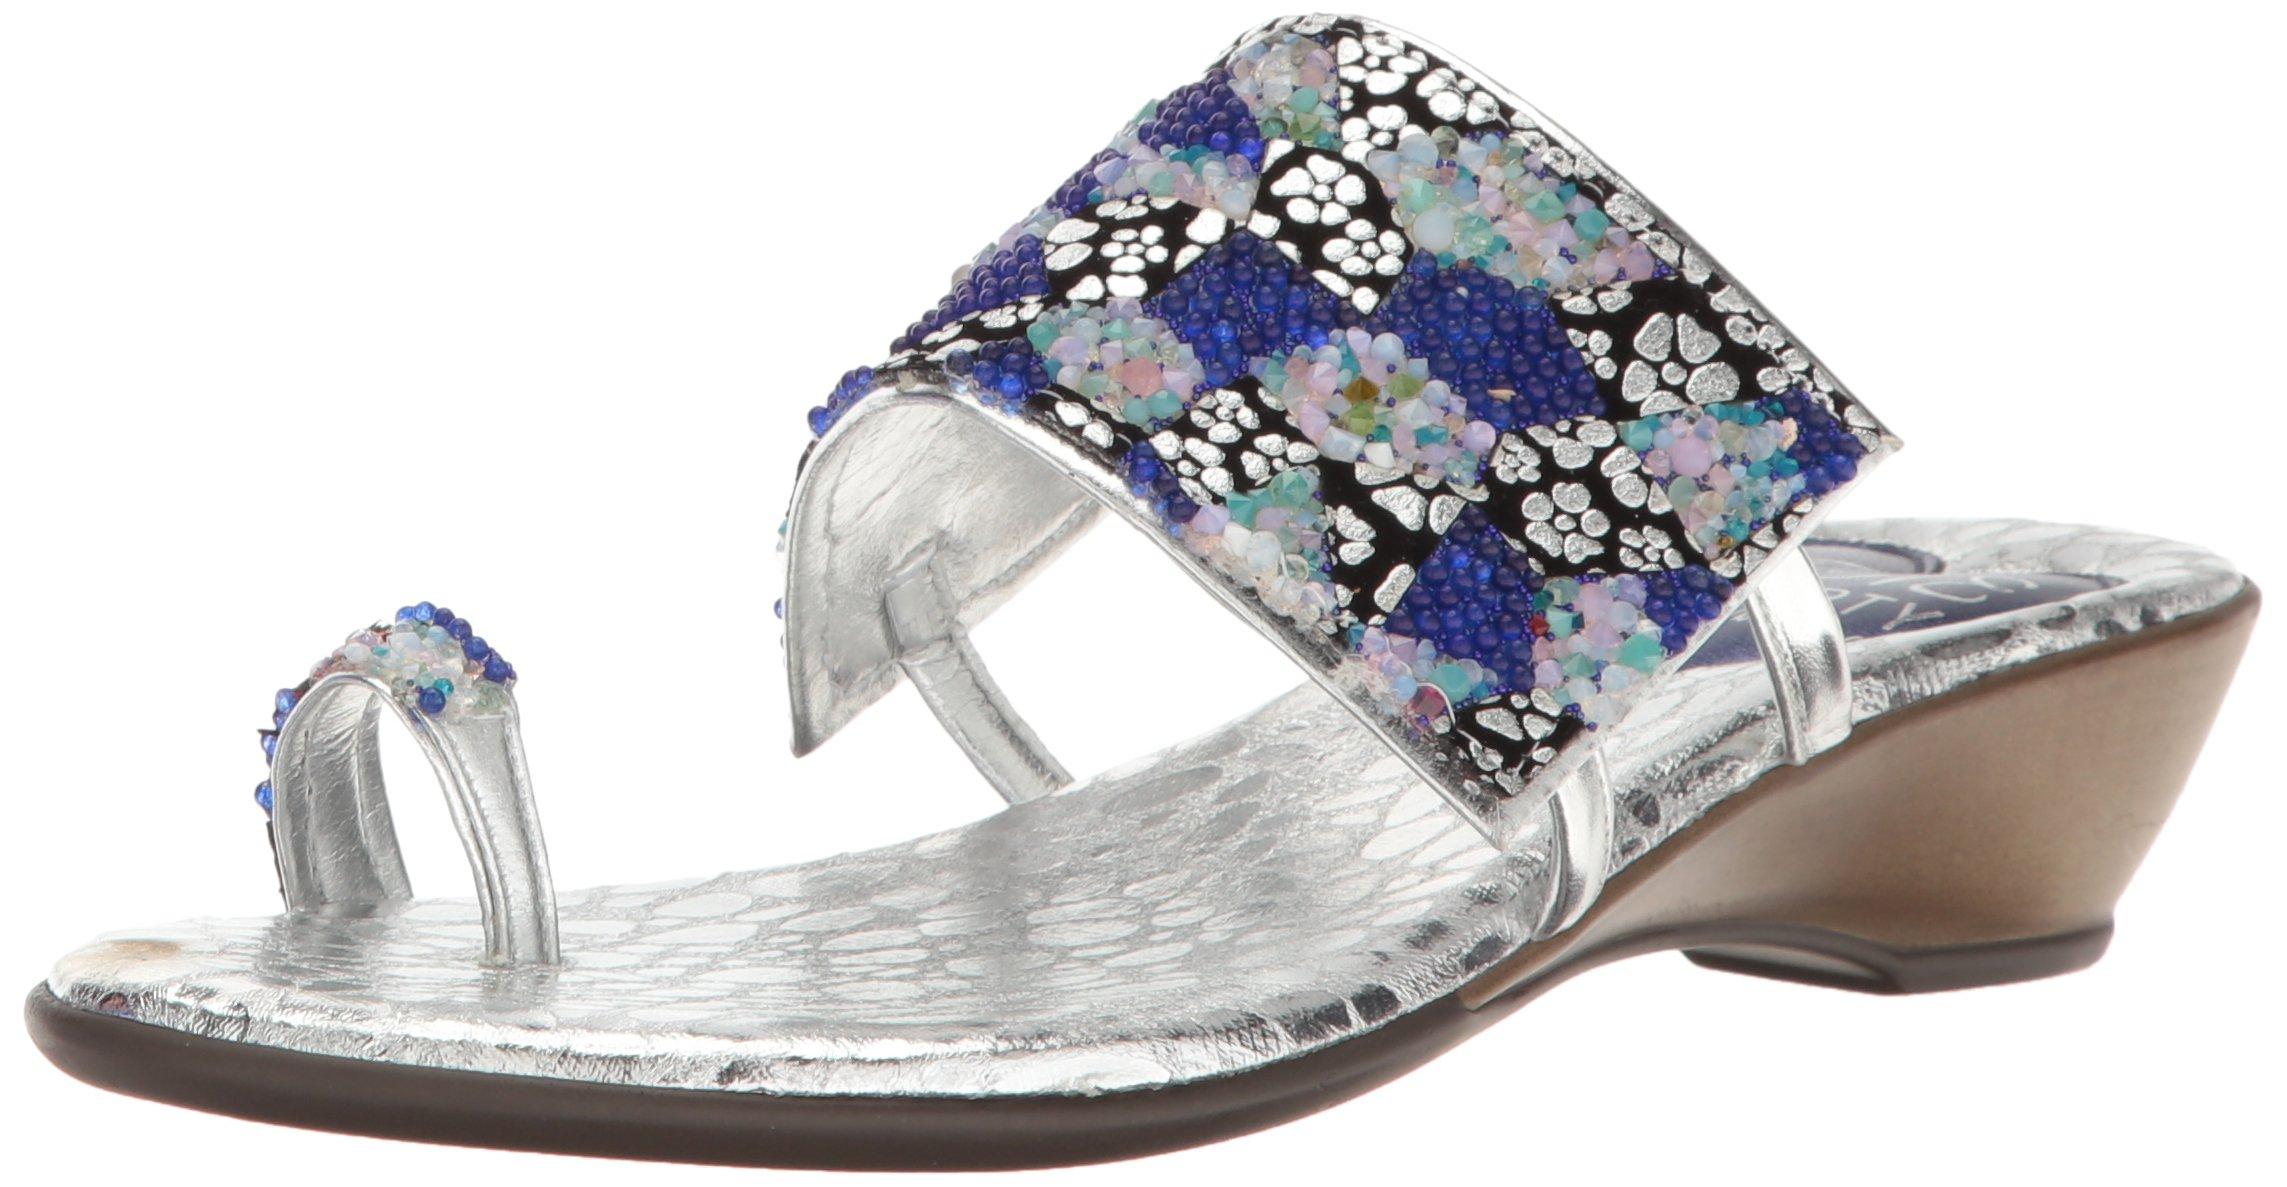 Love & Liberty Women's Symone-LL Dress Sandal, Mos Blue, 7 M US